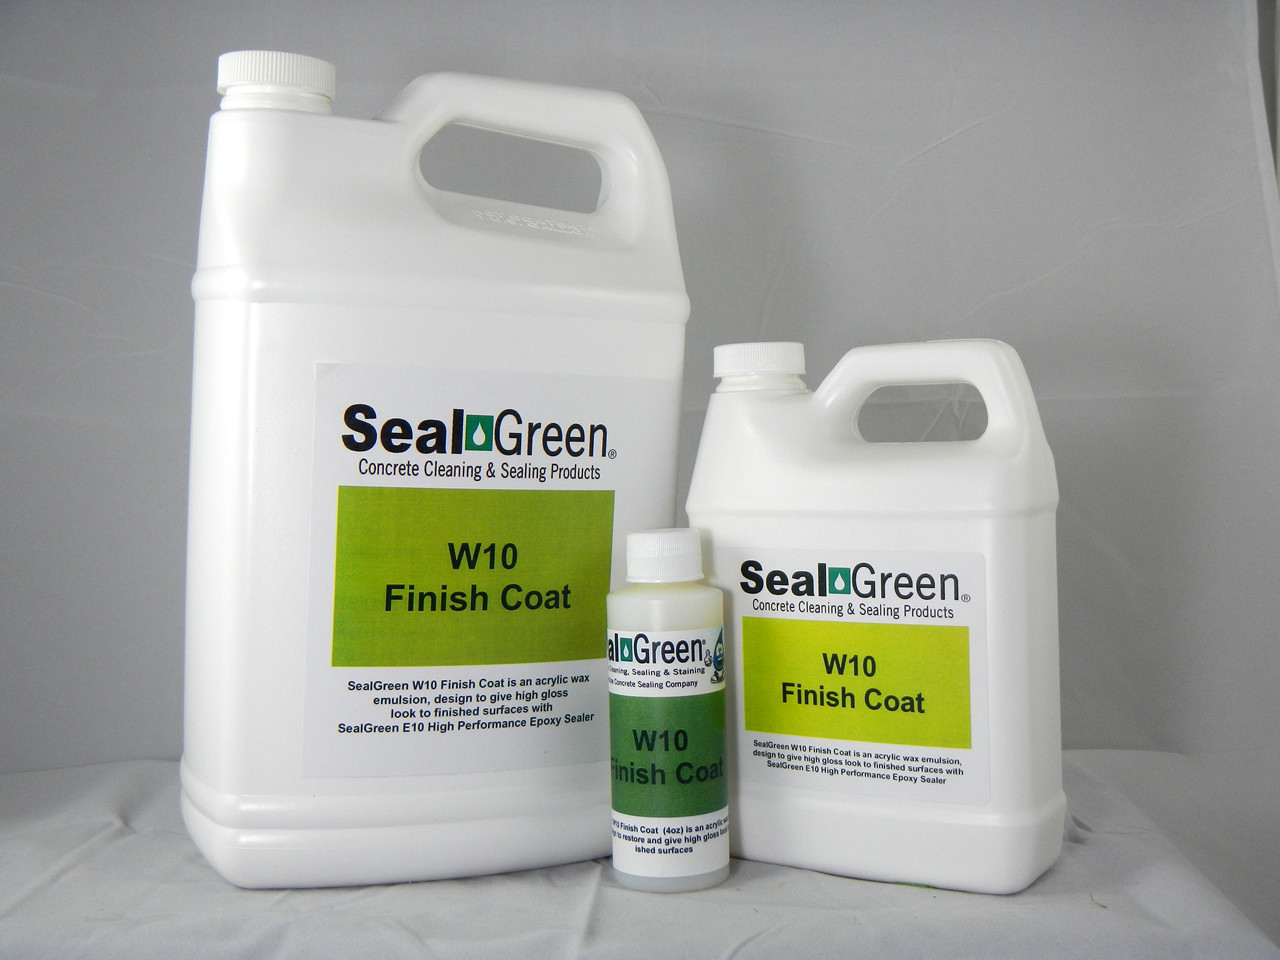 SealGreen W10 High Gloss Finish Coat